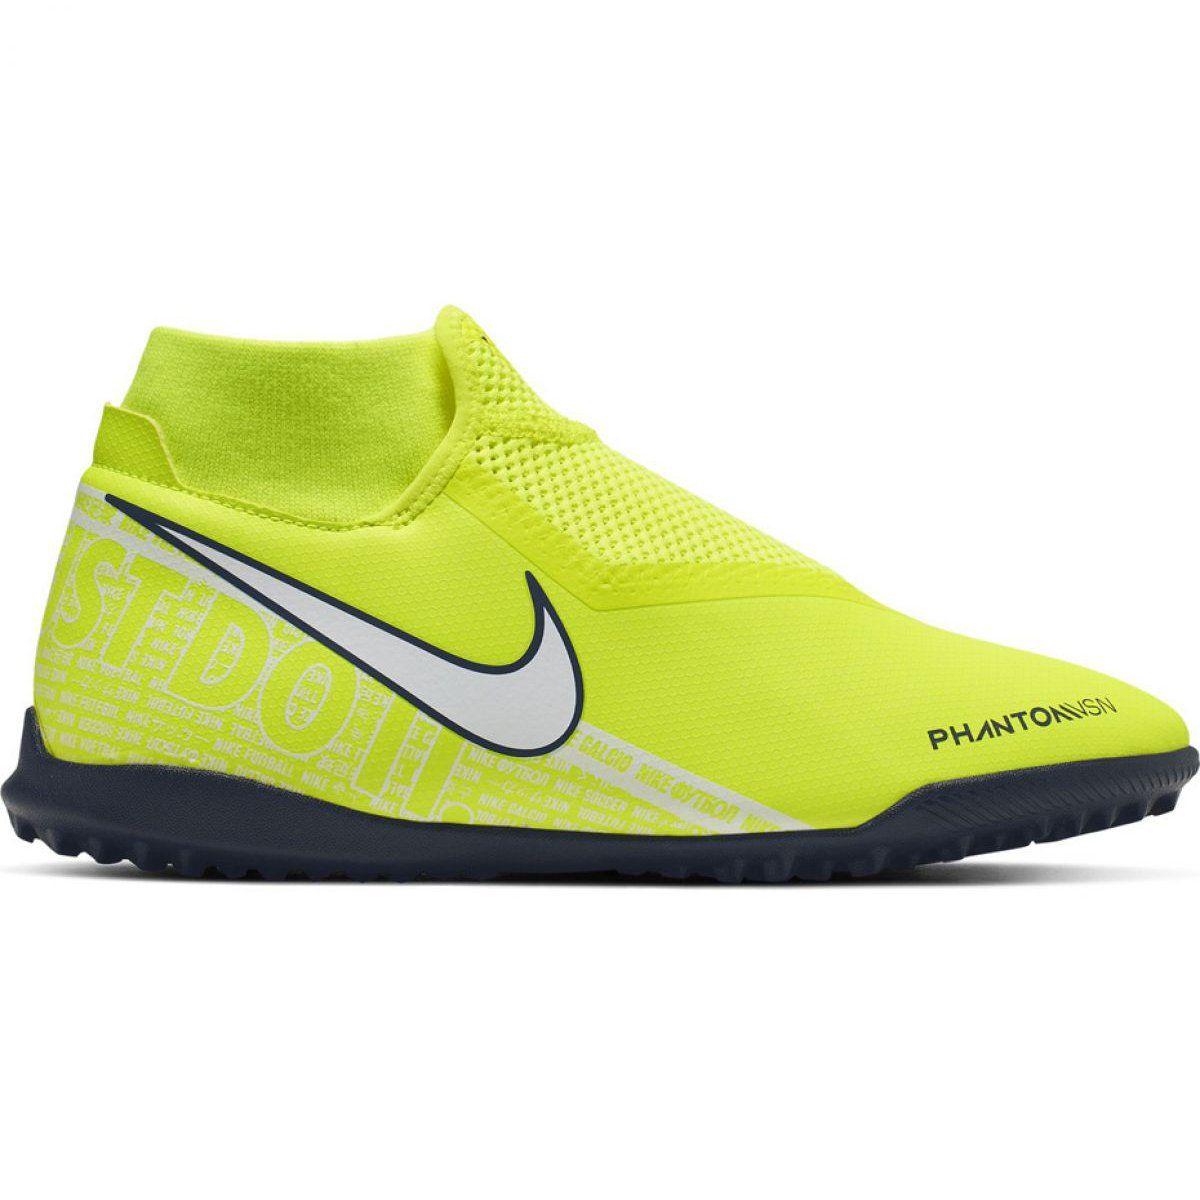 Buty Pilkarskie Nike Phantom Vsn Academy Df Tf M Ao3269 717 Zolte Zolte Football Shoes Nike Football Boots